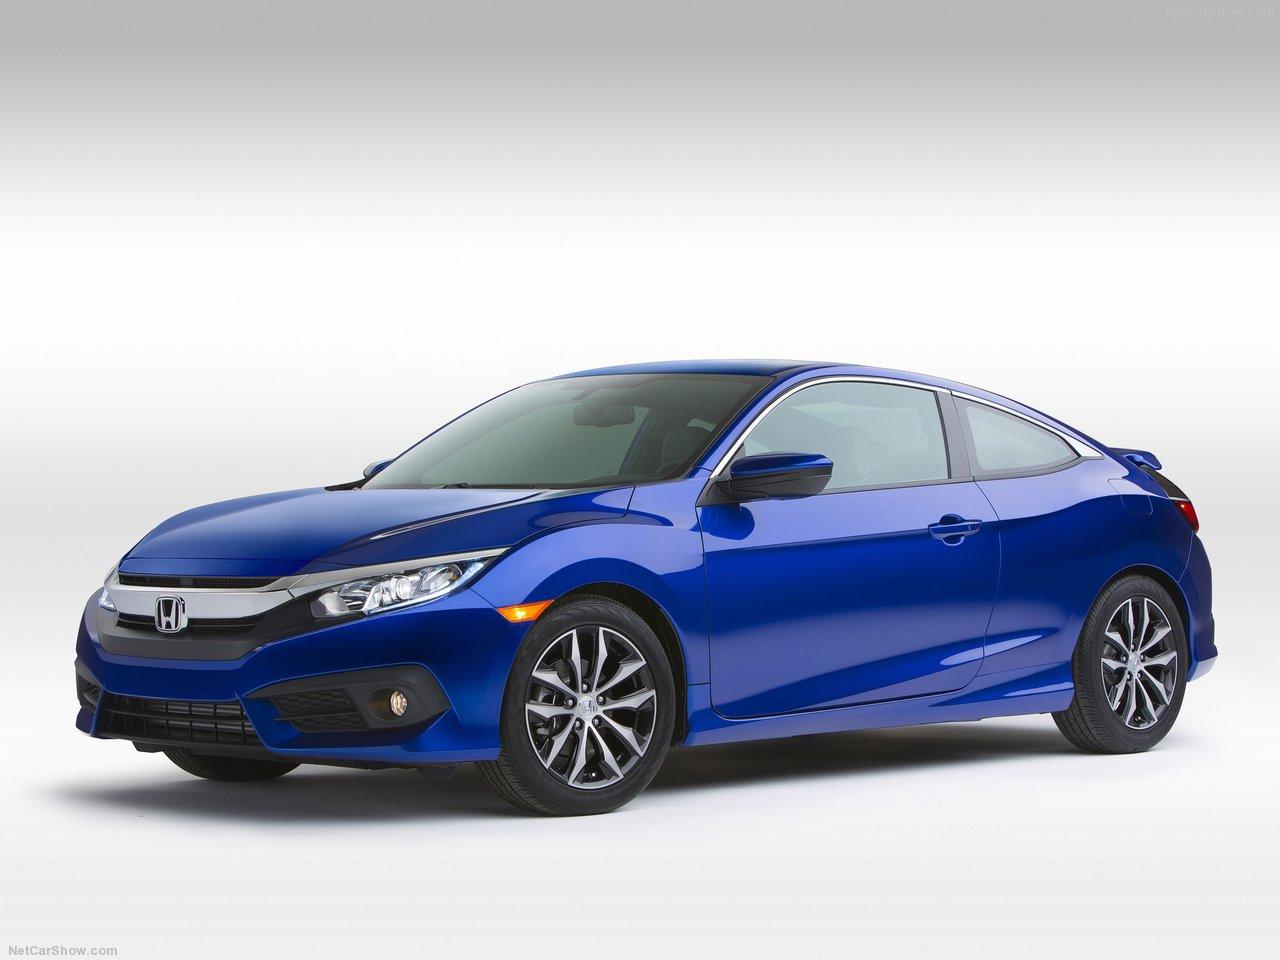 Honda-Civic_Coupe_2016_1280x960_wallpaper_01